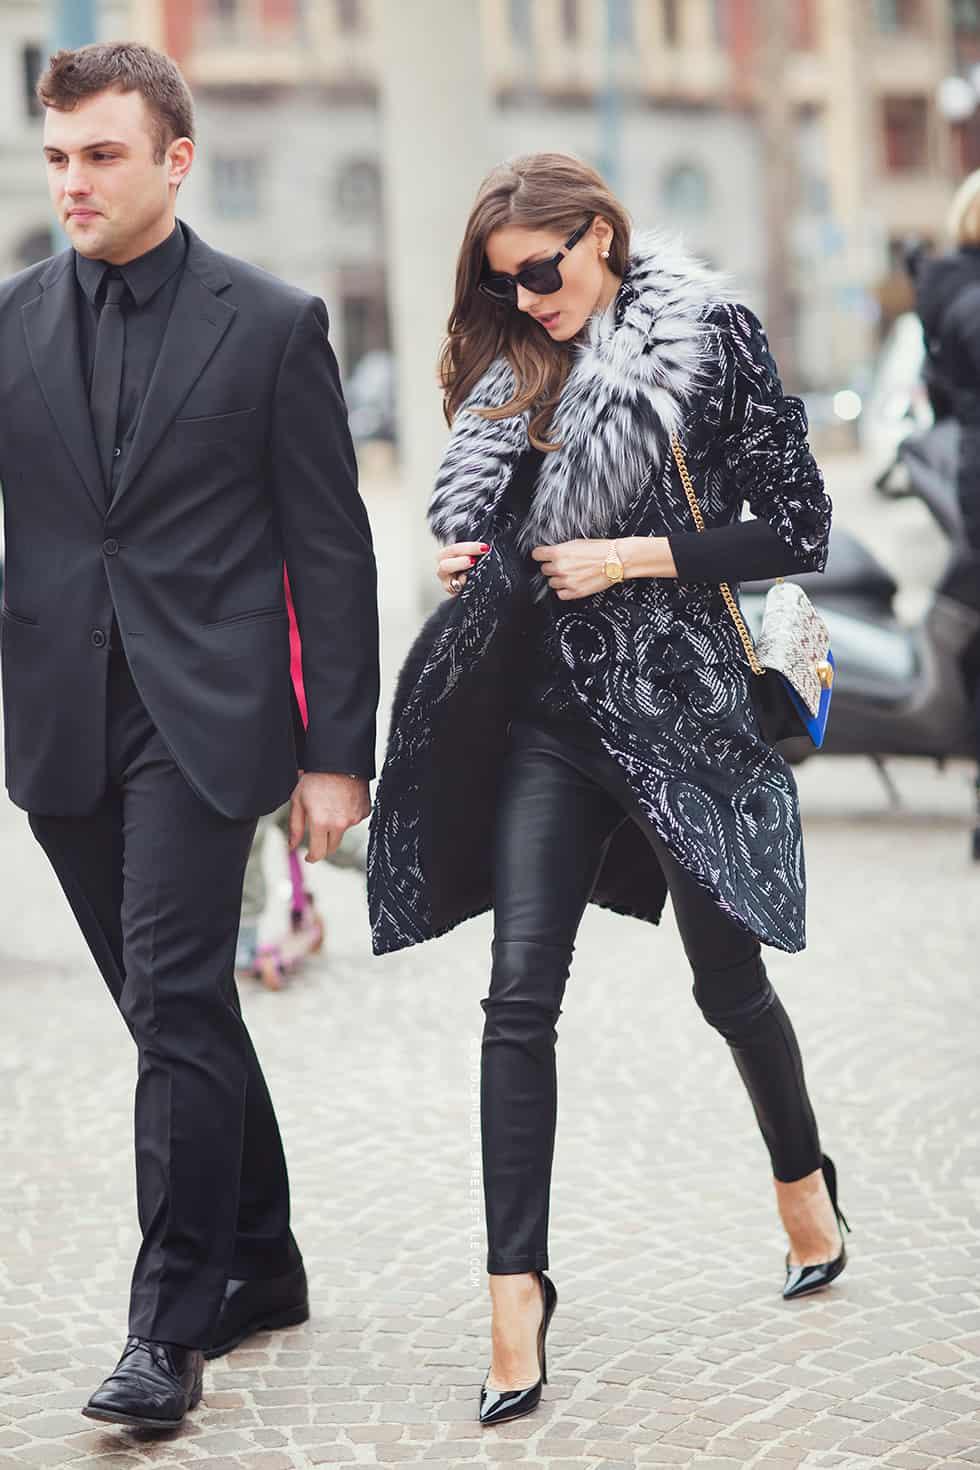 street-style-trend-statement-coats (5)